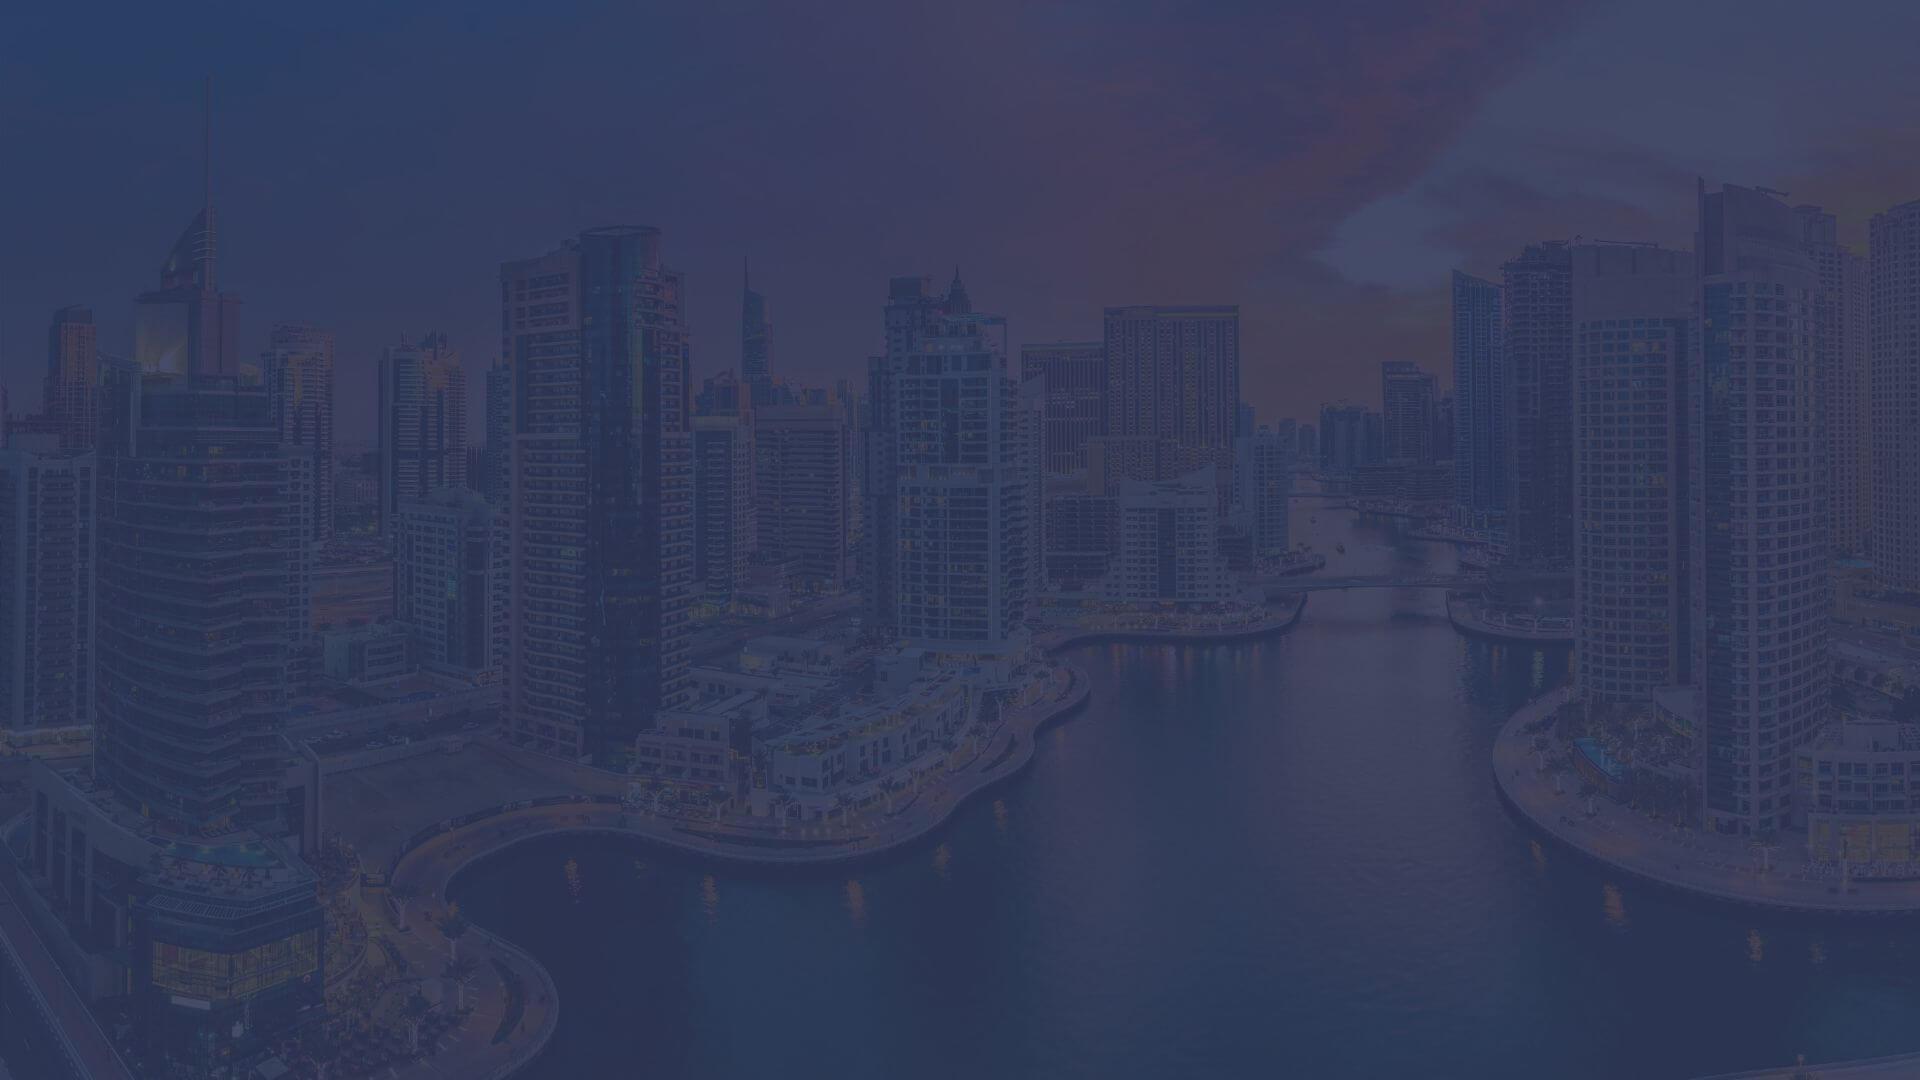 Programs Background image - Dubai